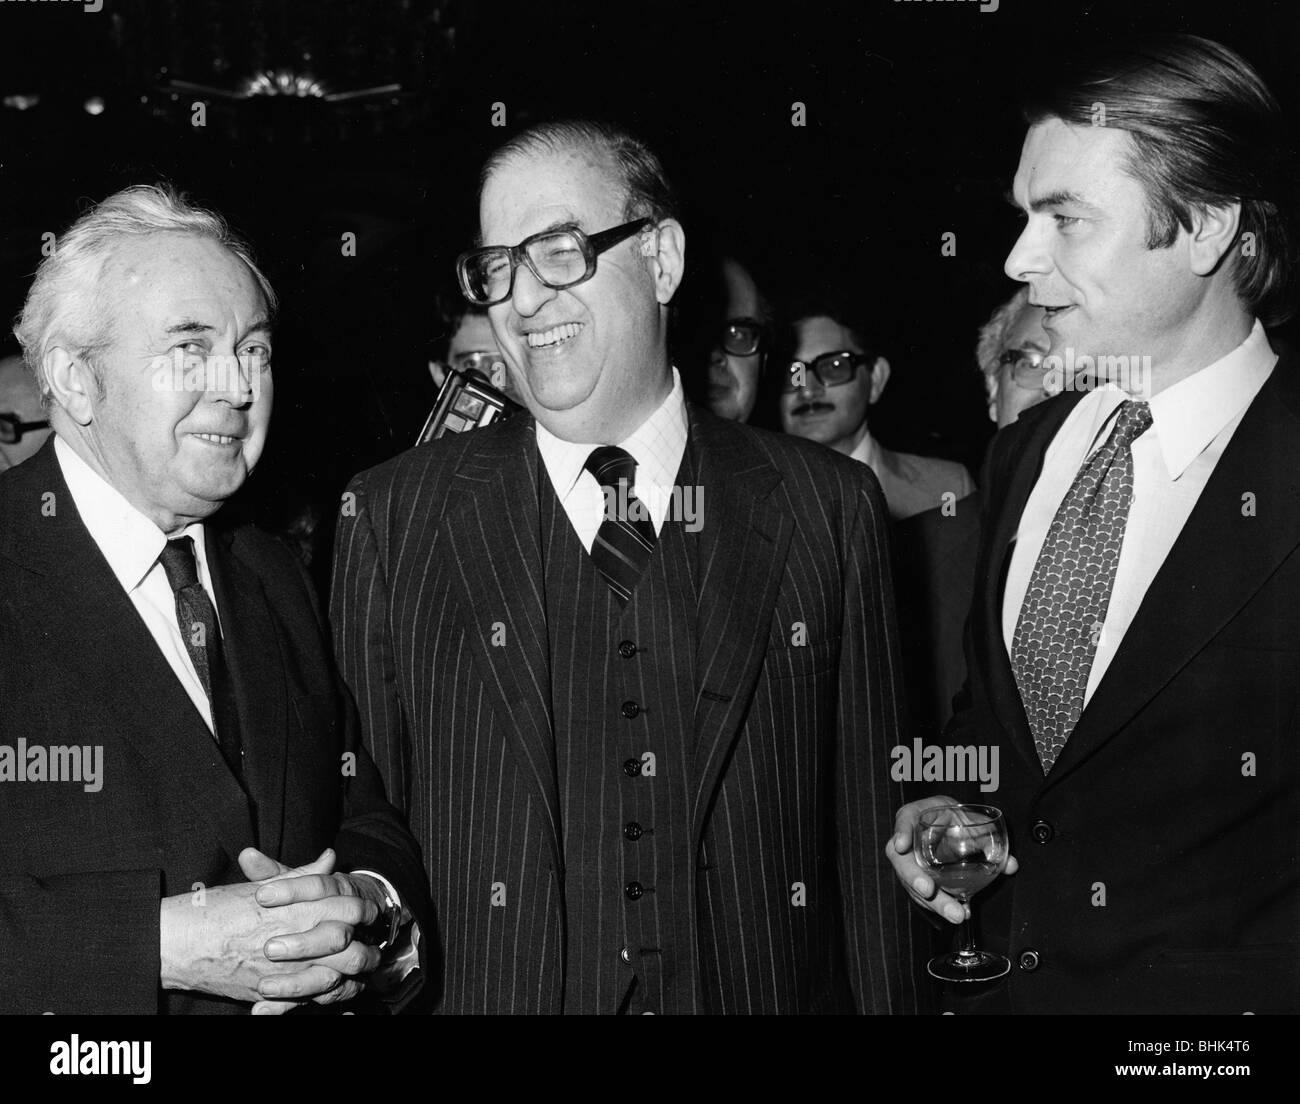 Abba Eban, Israeli foreign minister, Harlod Wilson, former PM, David Owen, Foreign Minister, 1979. - Stock Image